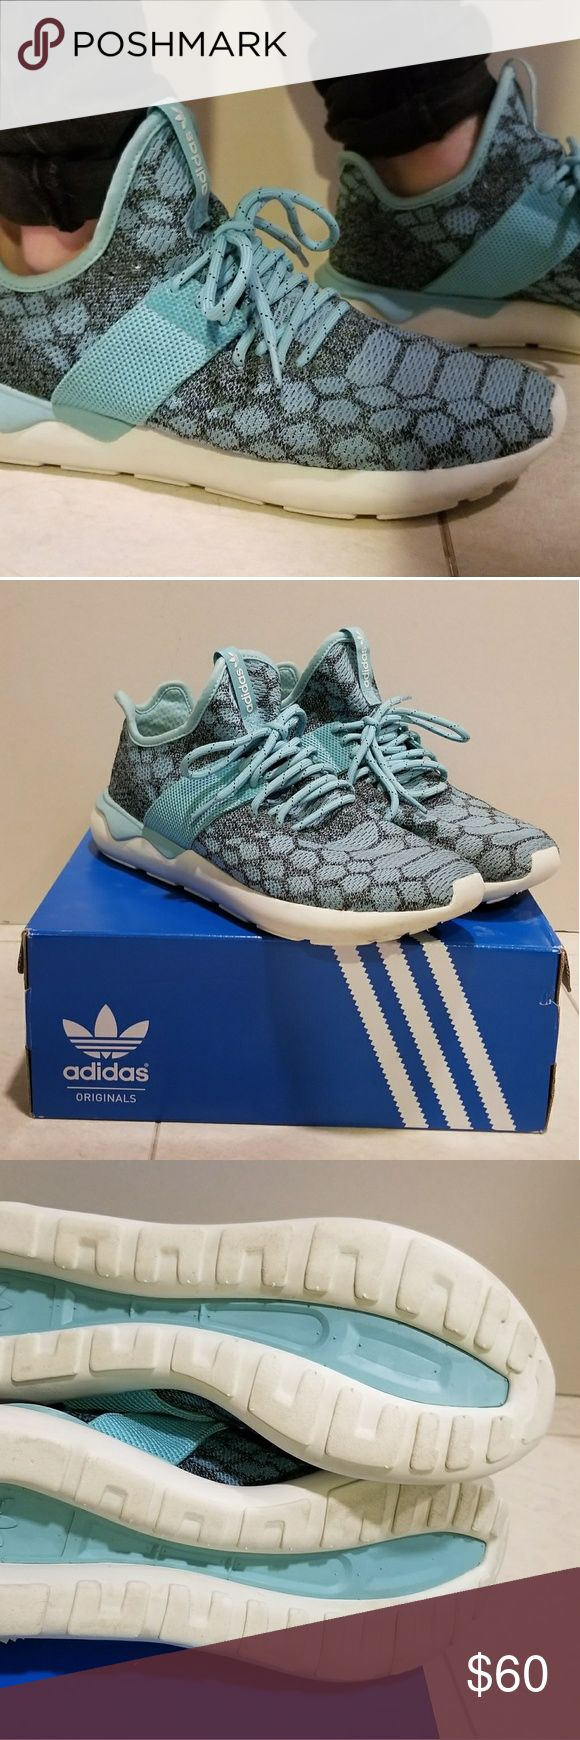 Adidas tubular runner Prime Knit sz 10 Men Mens sz 10. Like new 8.5/10 adidas Shoes Sneakers